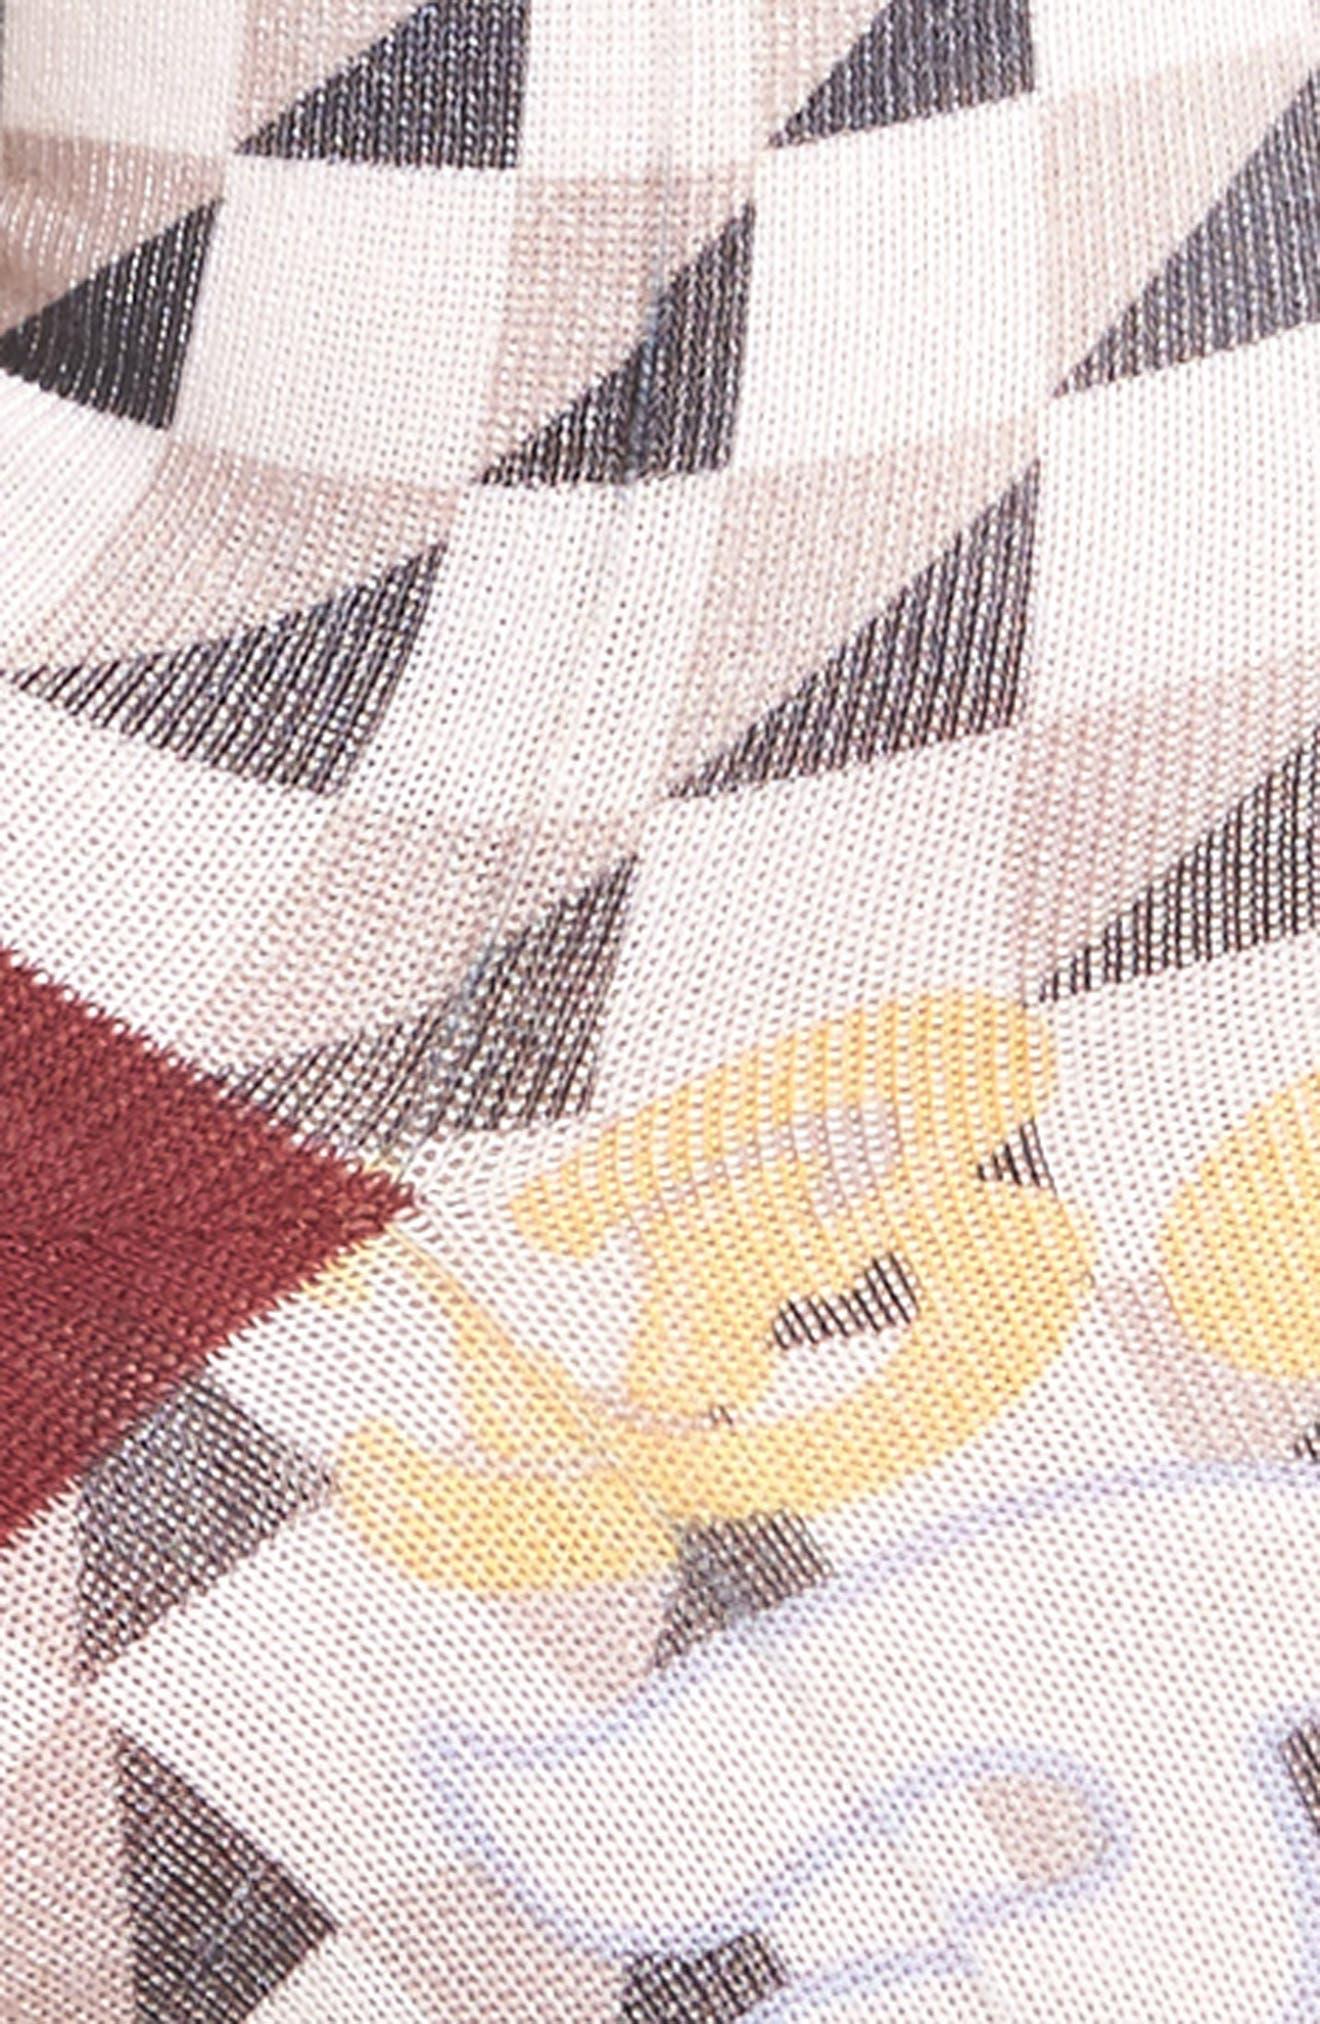 Lowrider Supa Wavy Socks,                             Alternate thumbnail 3, color,                             White Multi